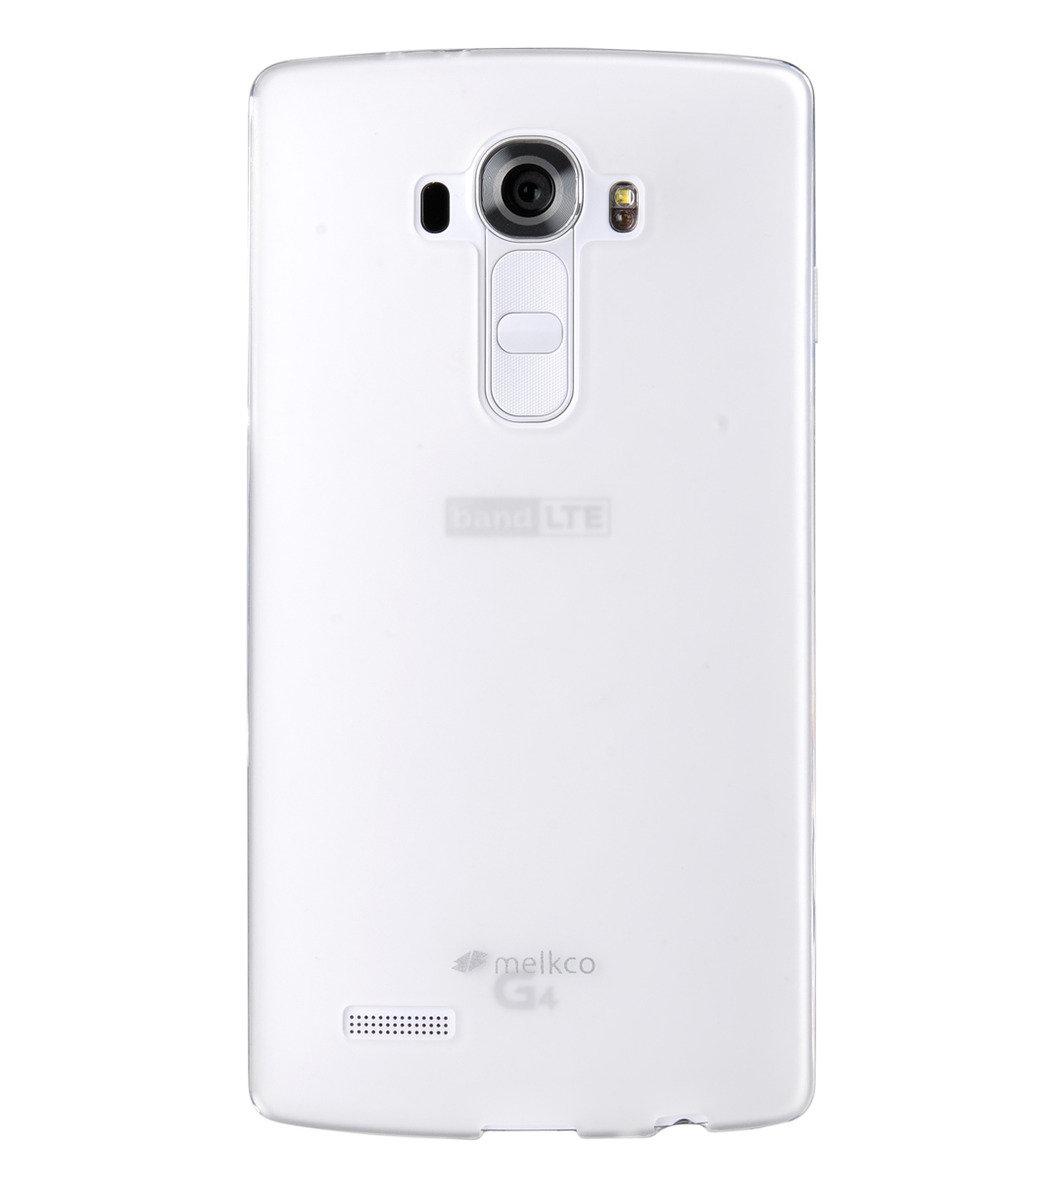 LG Optimus G4 Poly Jacket 手機保護殼 - 透明色(附送屏幕保護貼)